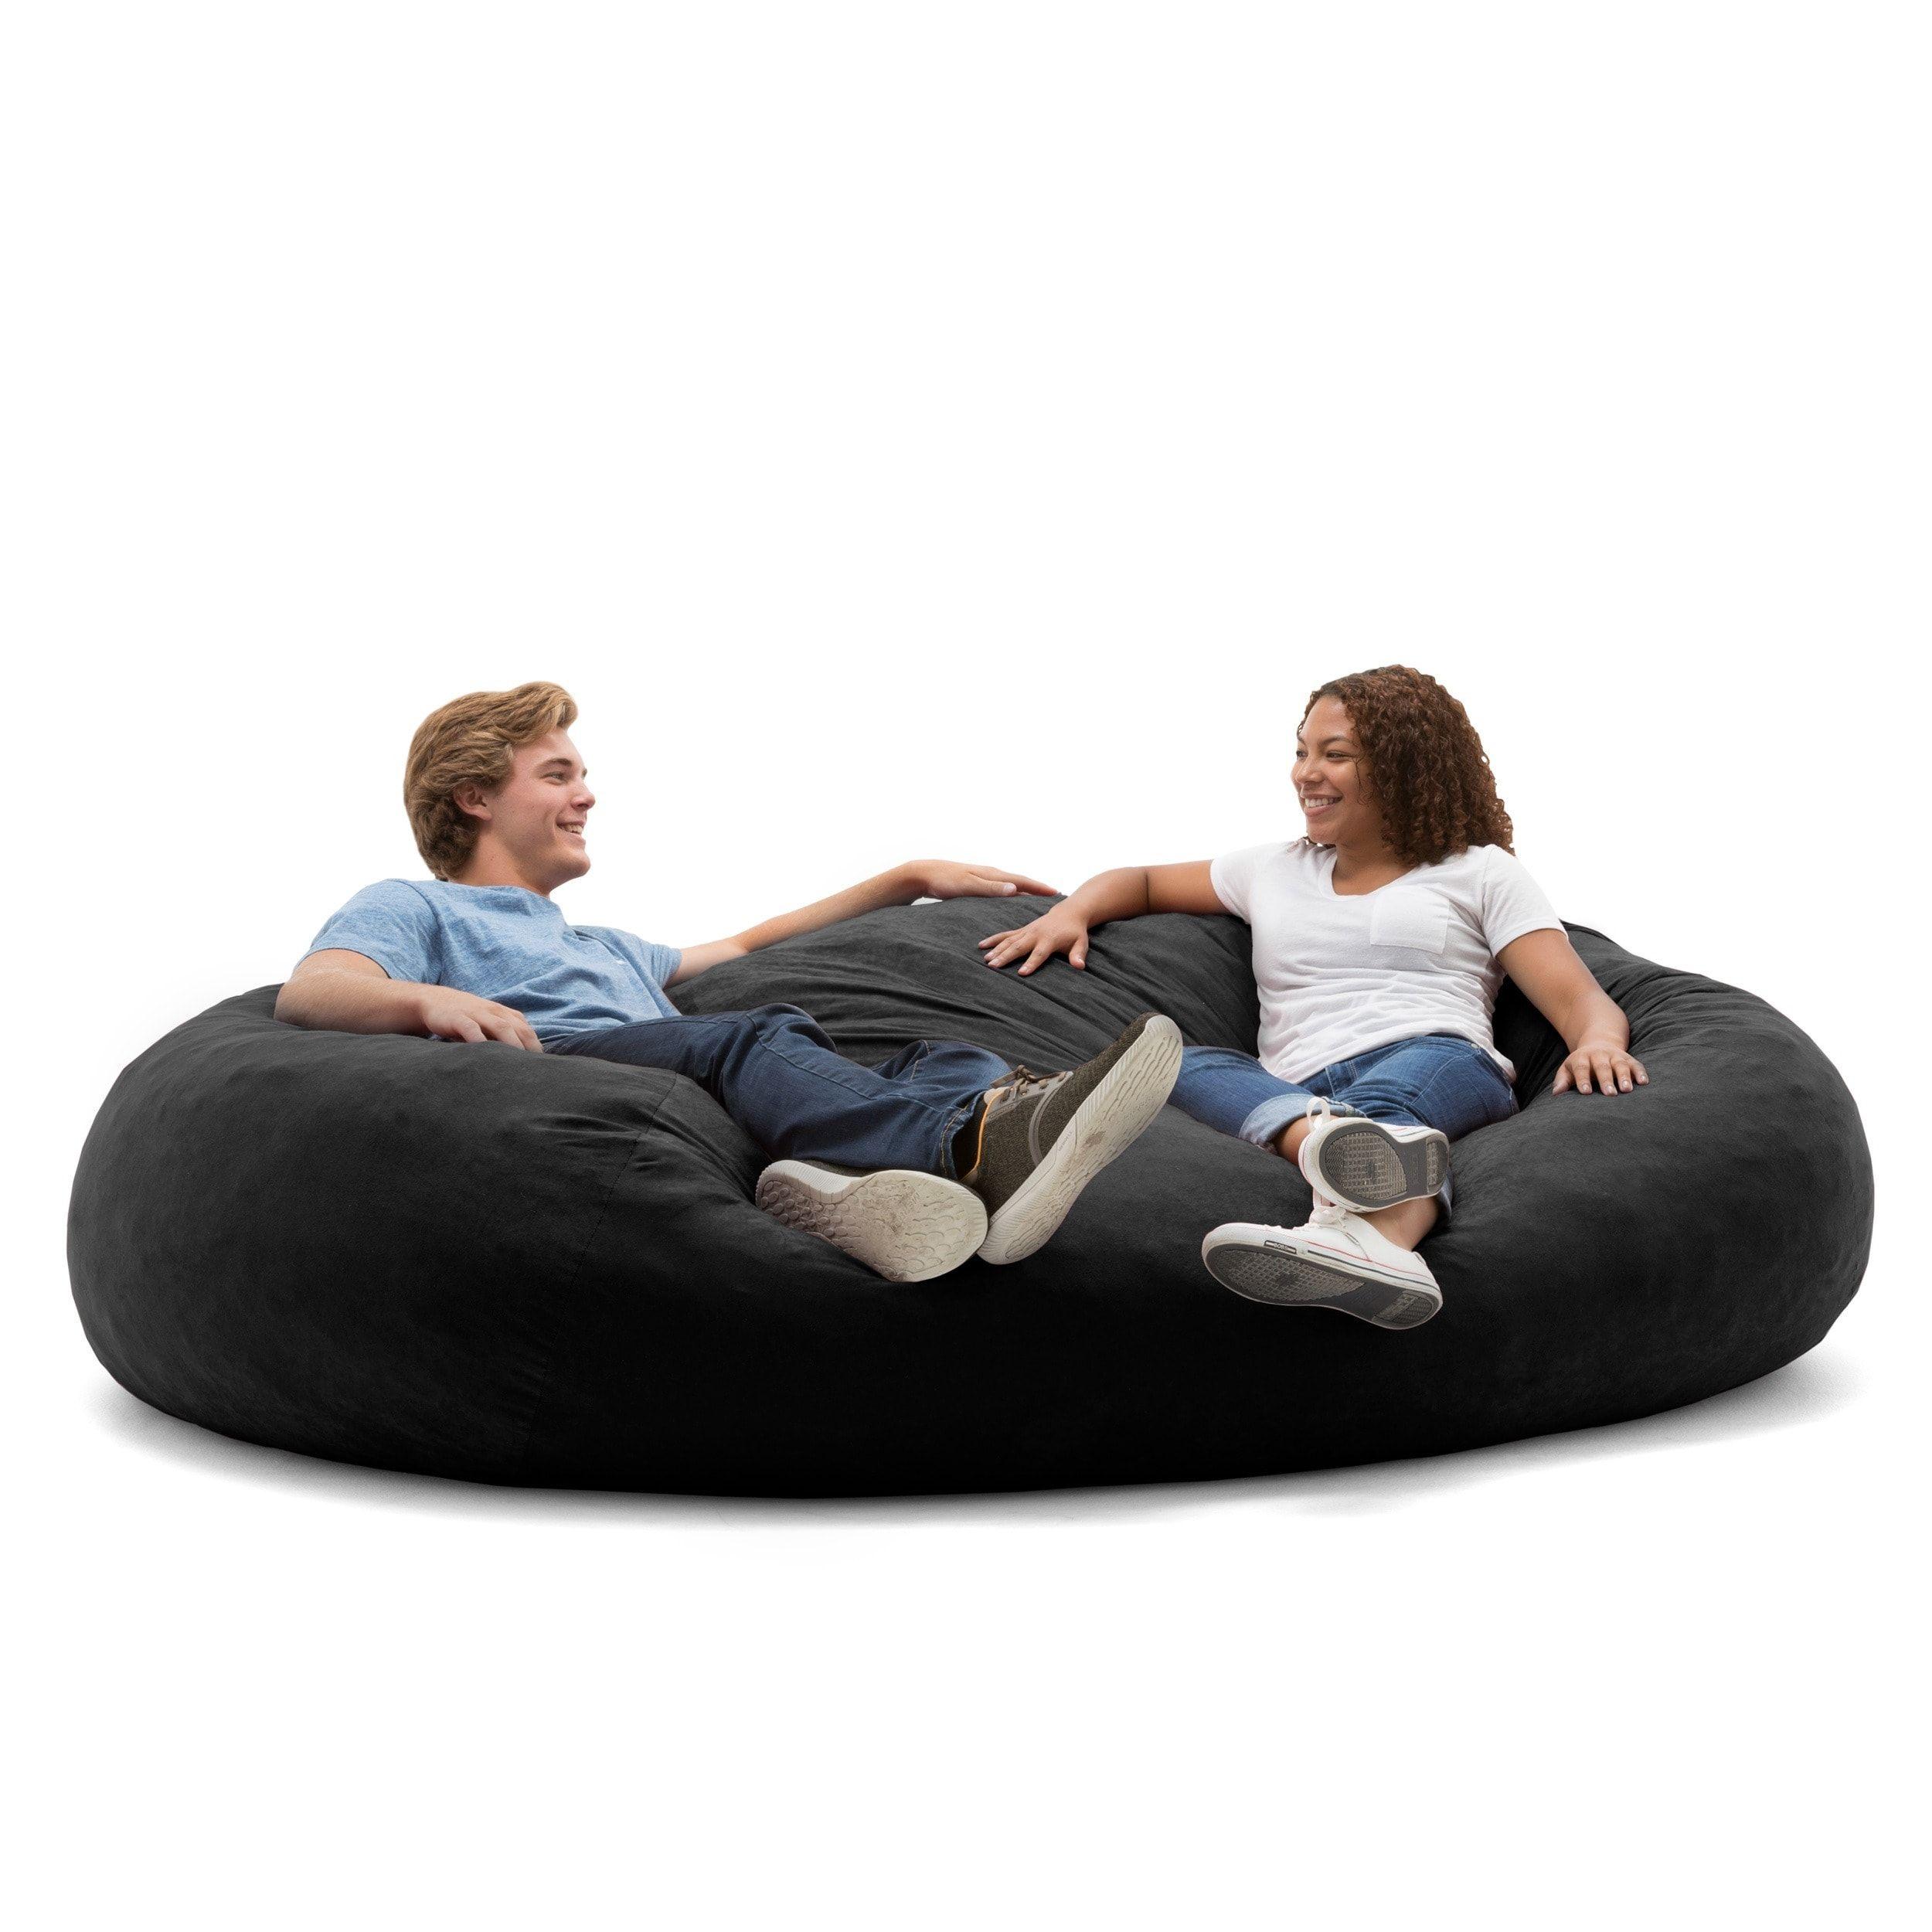 xxl fuf chair swimming pool lounge chairs big joe black onyx size extra large foam